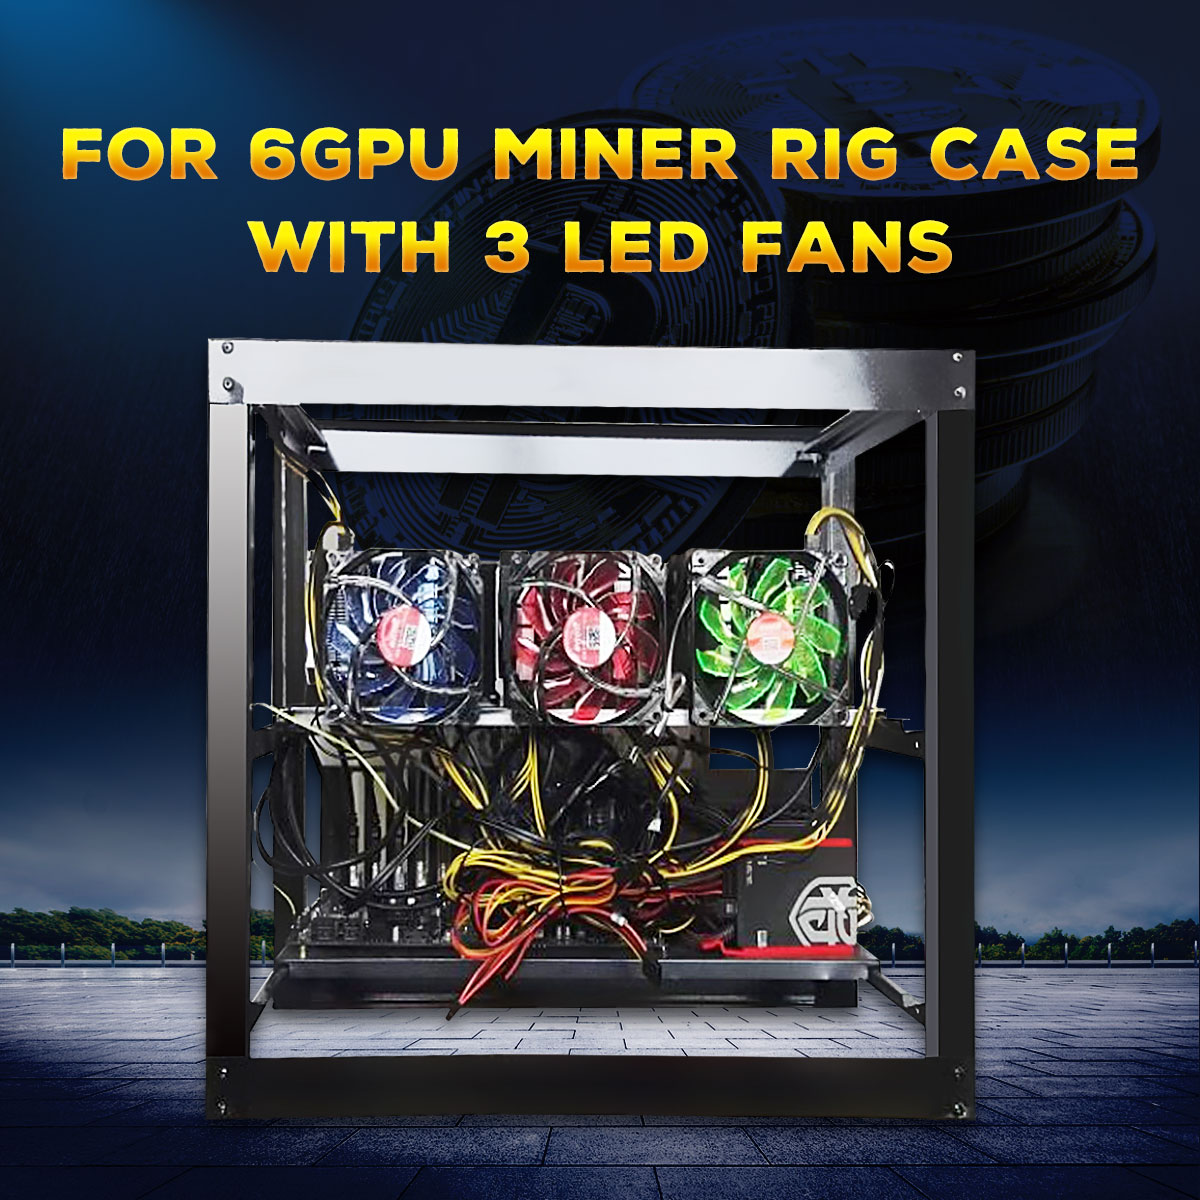 купить New Open Air 6GPU Frame Mining Miner Rig Case with 3 LED Fans for ETH BTC Ethereum DIY Mining Machine по цене 4331.44 рублей